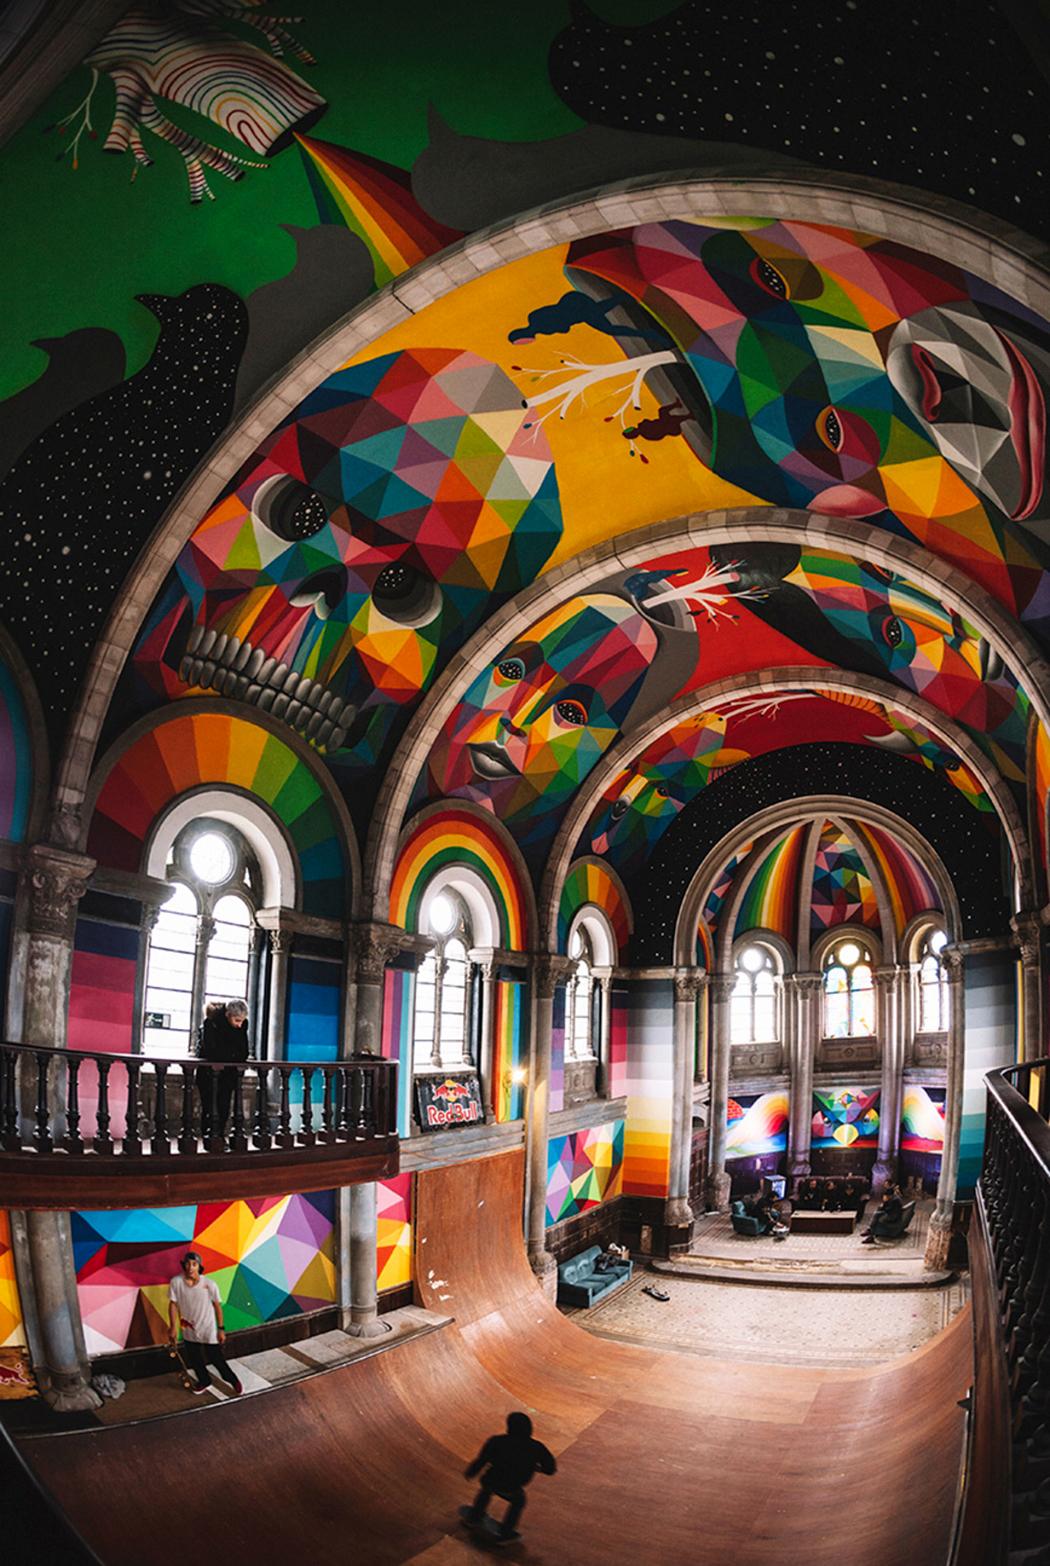 Street Art - okuda - san miguel - mural - church